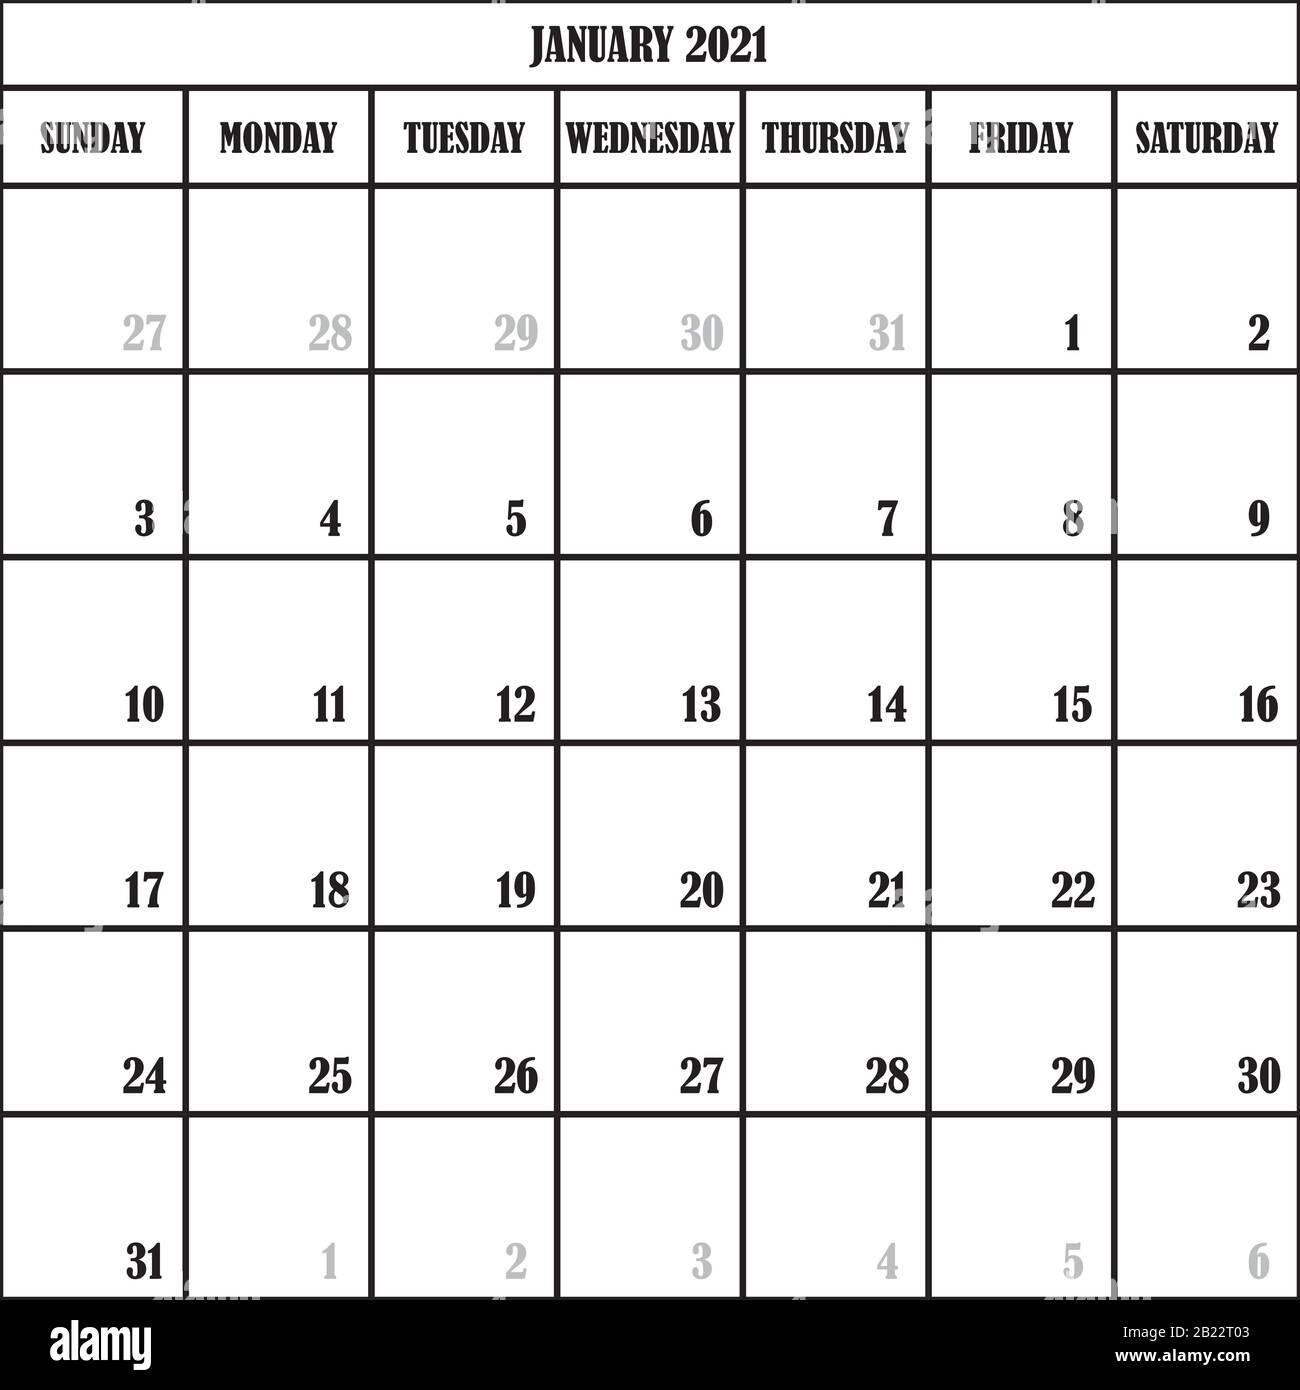 Calendario Gennaio 2021 Colorato CALENDARIO PIANIFICATORE MESE GENNAIO 2021 SU SFONDO TRASPARENTE